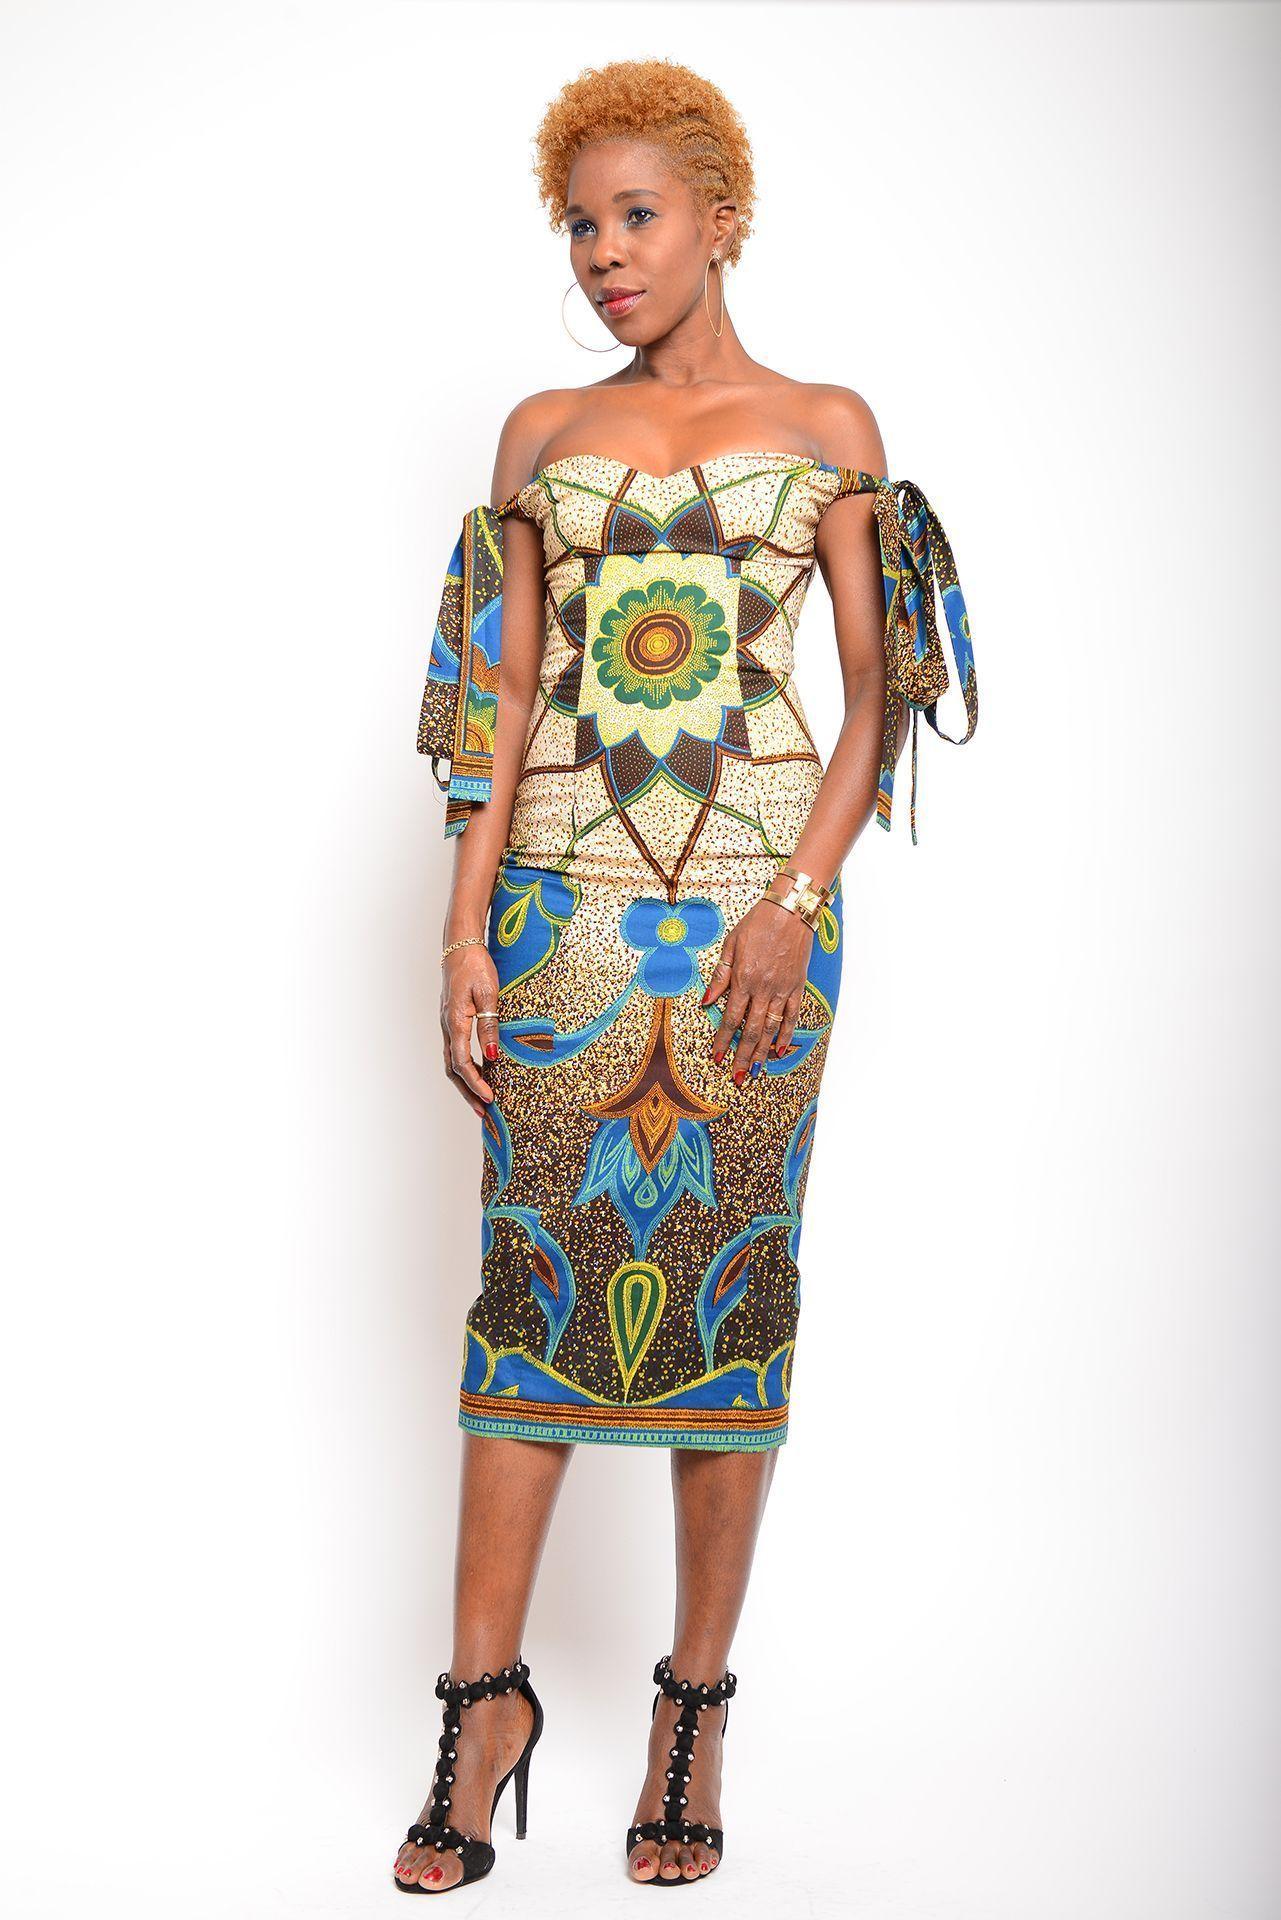 Afrikanisches Kleid Soundouce #afrikanischeskleid Afrikanisches Kleid Soundouce #afrikanischeskleid Afrikanisches Kleid Soundouce #afrikanischeskleid Afrikanisches Kleid Soundouce #afrikanischeskleid Afrikanisches Kleid Soundouce #afrikanischeskleid Afrikanisches Kleid Soundouce #afrikanischeskleid Afrikanisches Kleid Soundouce #afrikanischeskleid Afrikanisches Kleid Soundouce #afrikanischeskleid